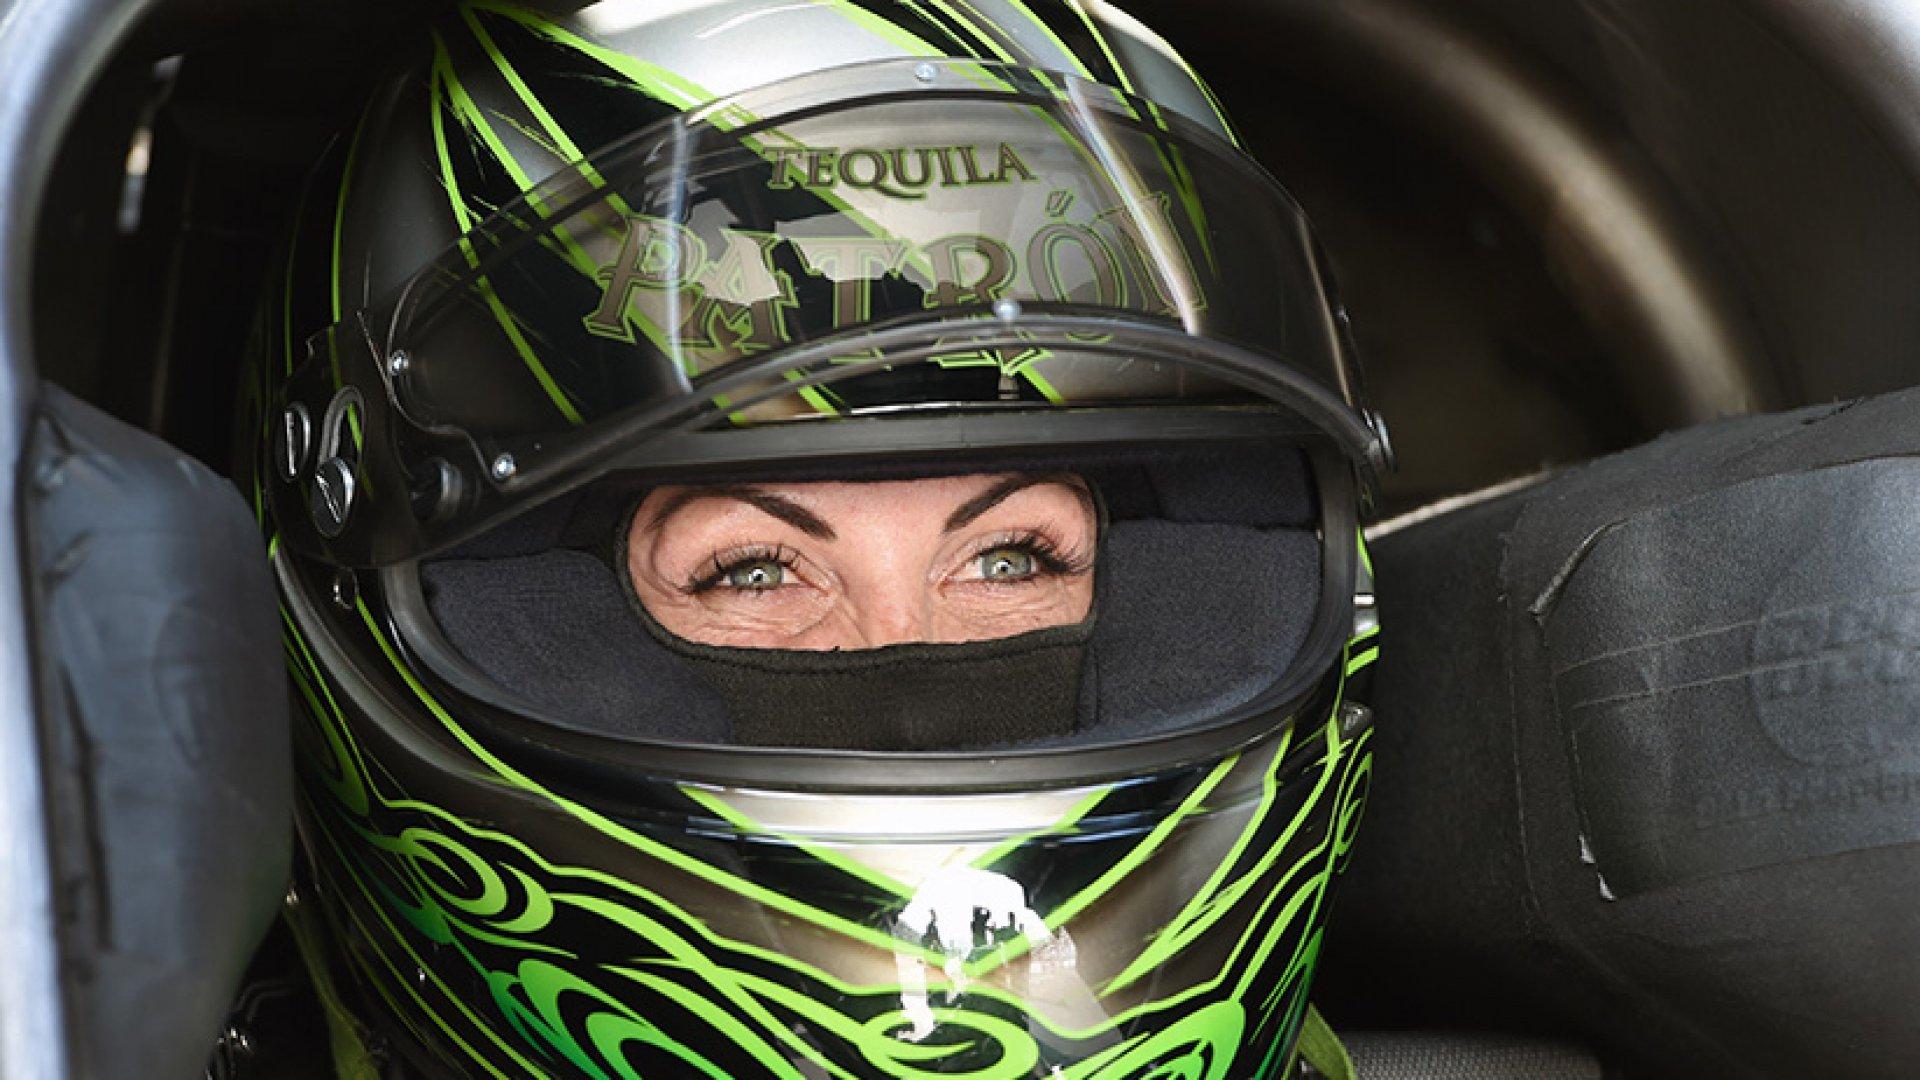 Entrepreneurs: Tap Into Your Inner Race Car Driver